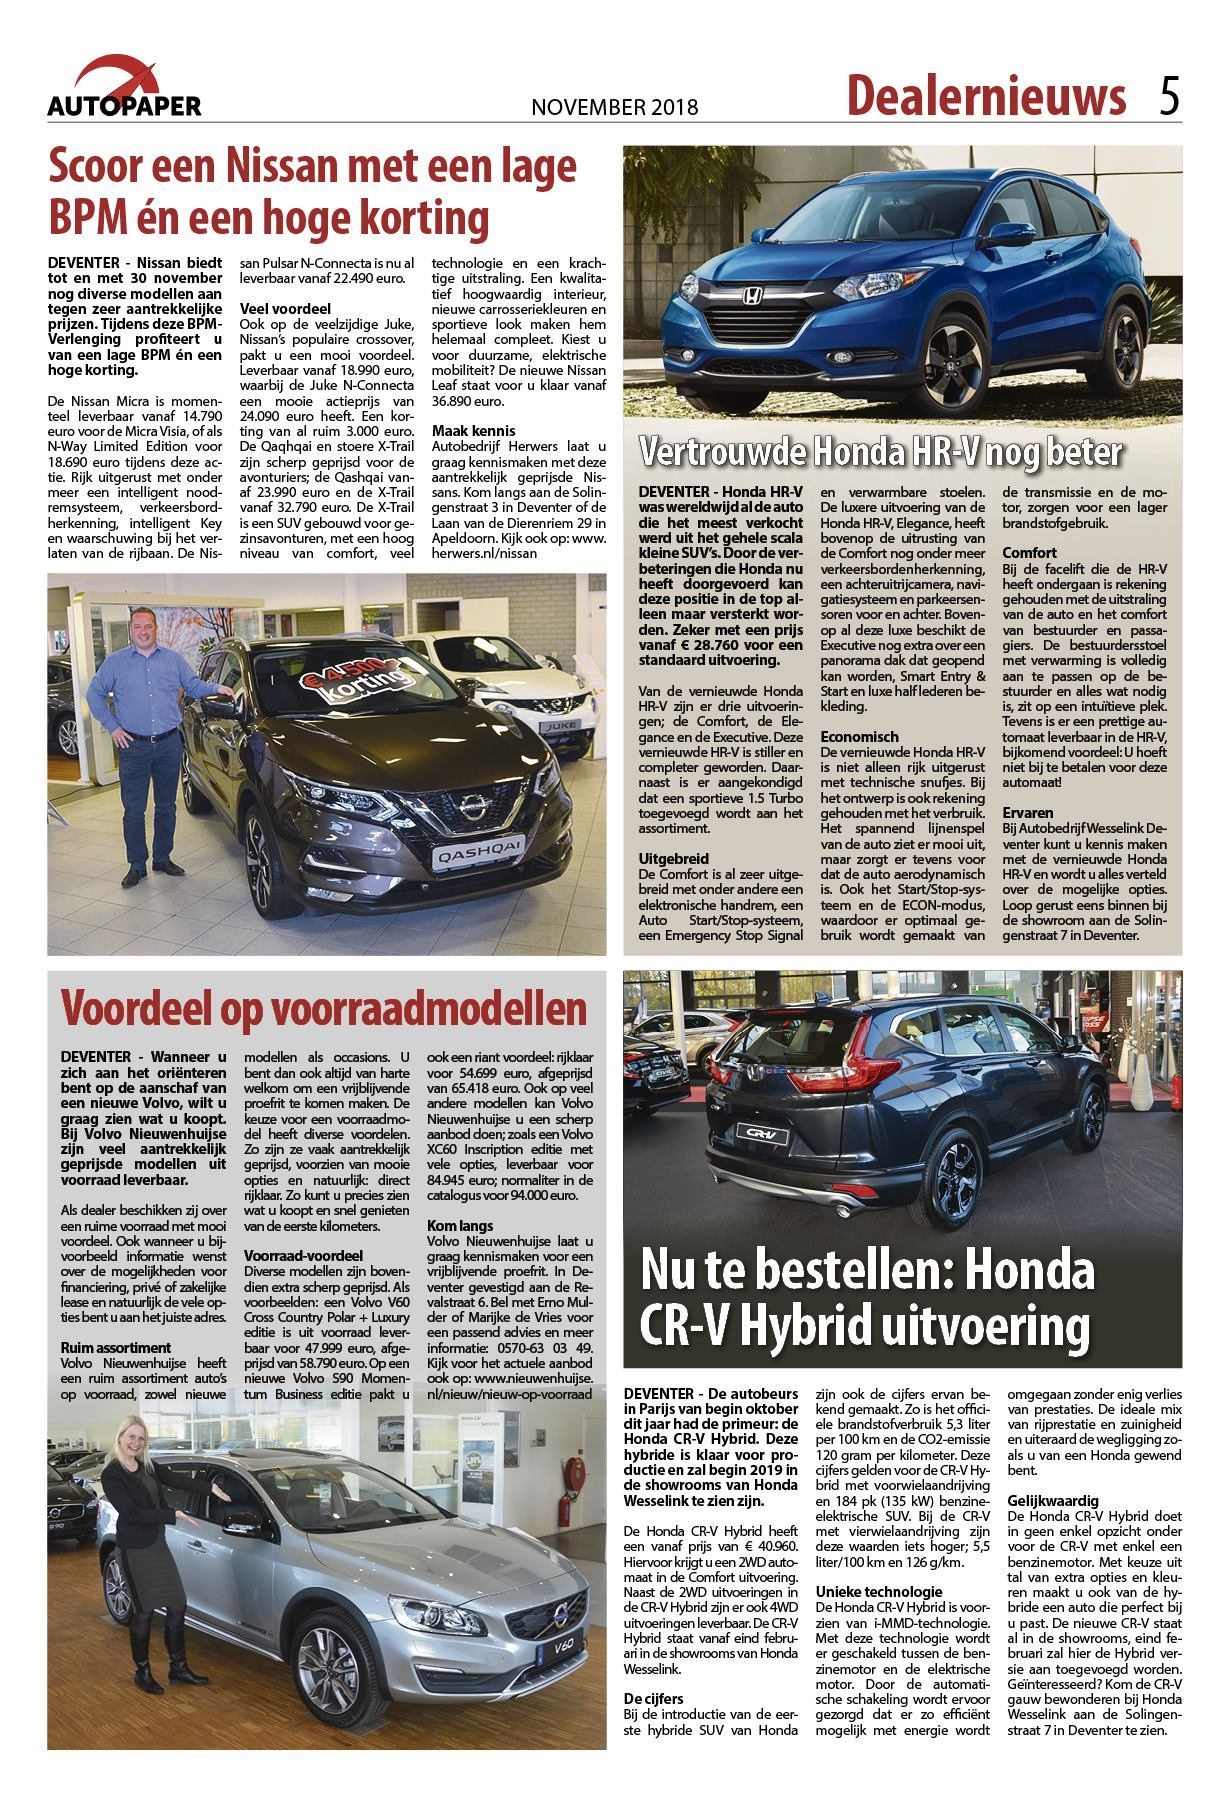 Autopaper Deventer 20 November 2018